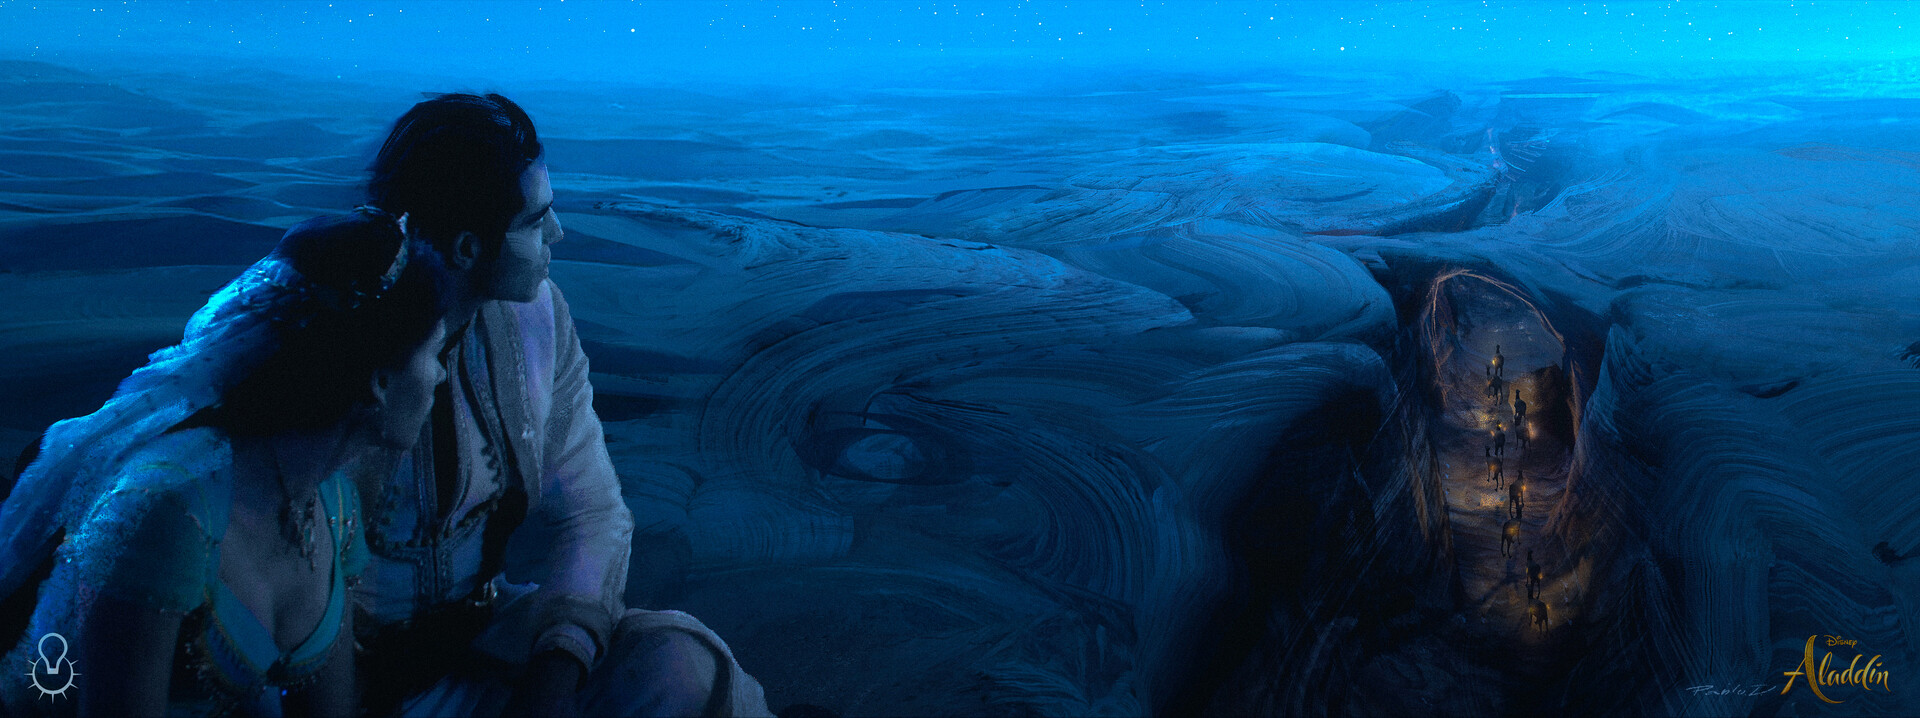 Aladdin [Disney - 2019] - Page 43 Pablo-dominguez-sl-wnw-ravine-v006-001-pd-1001